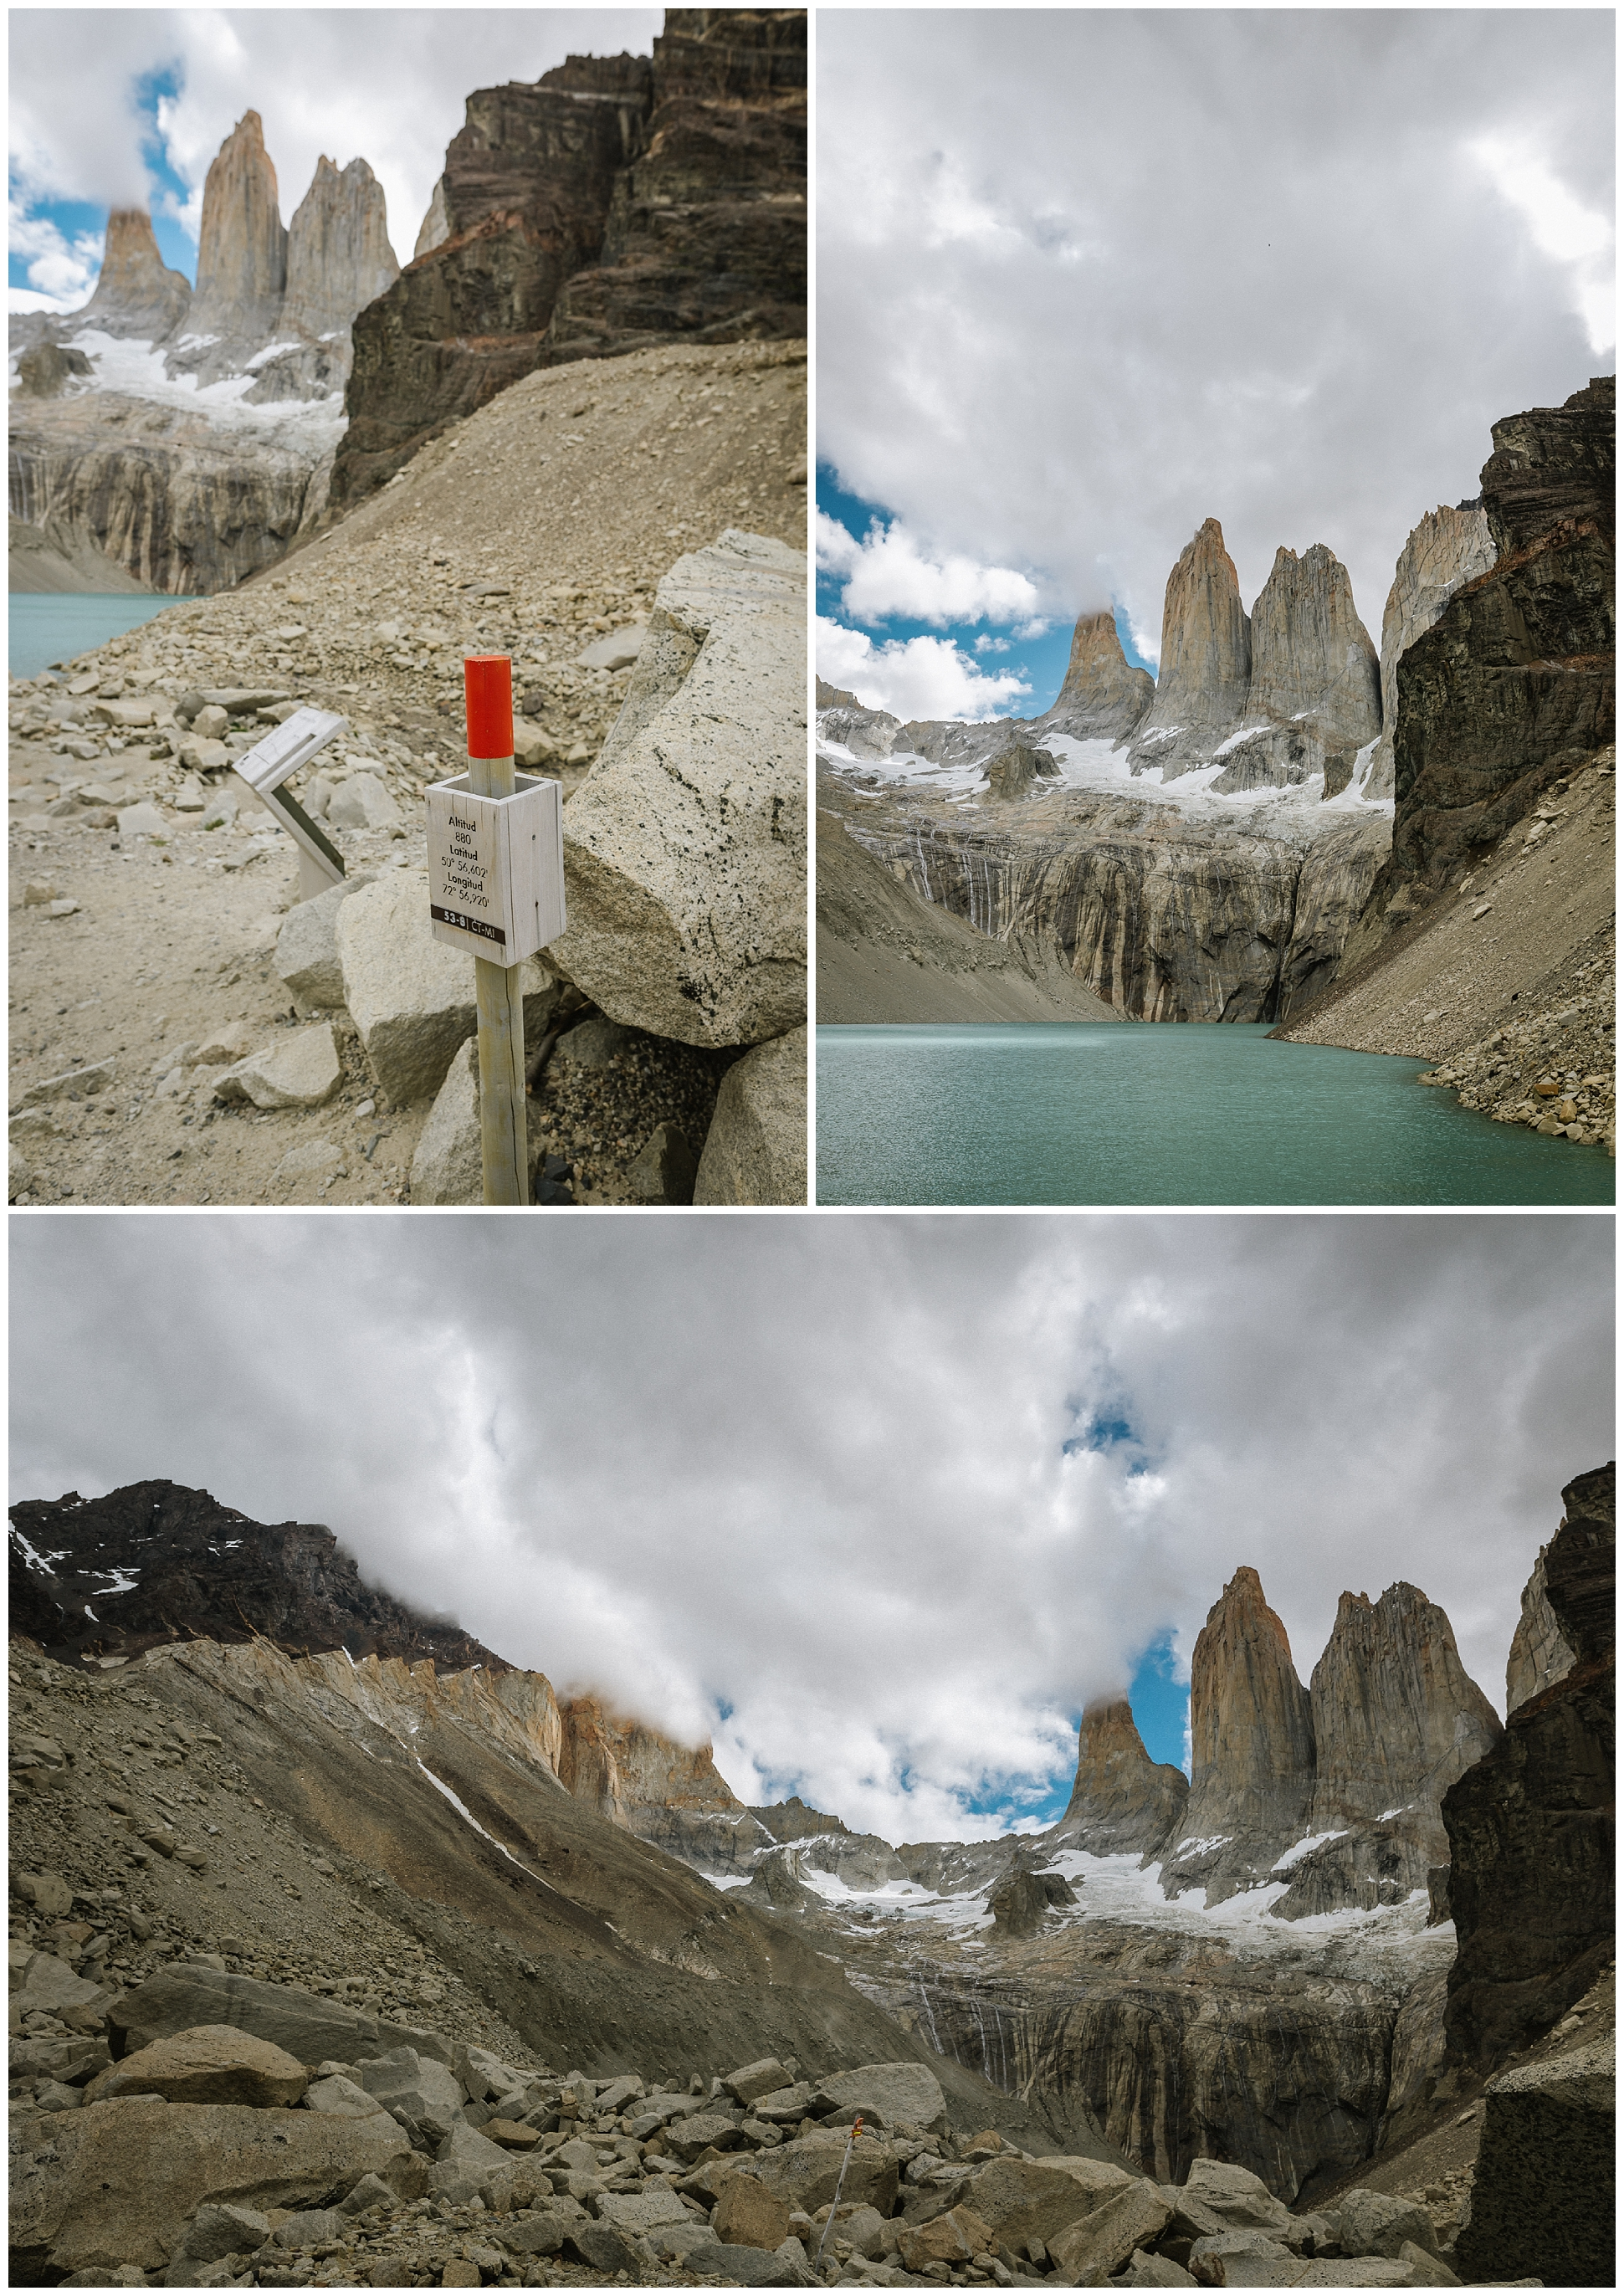 Cheilean-destination-adventure-wedding-florida-patagonia-pucon-santa-cruz-vsco_0007.jpg